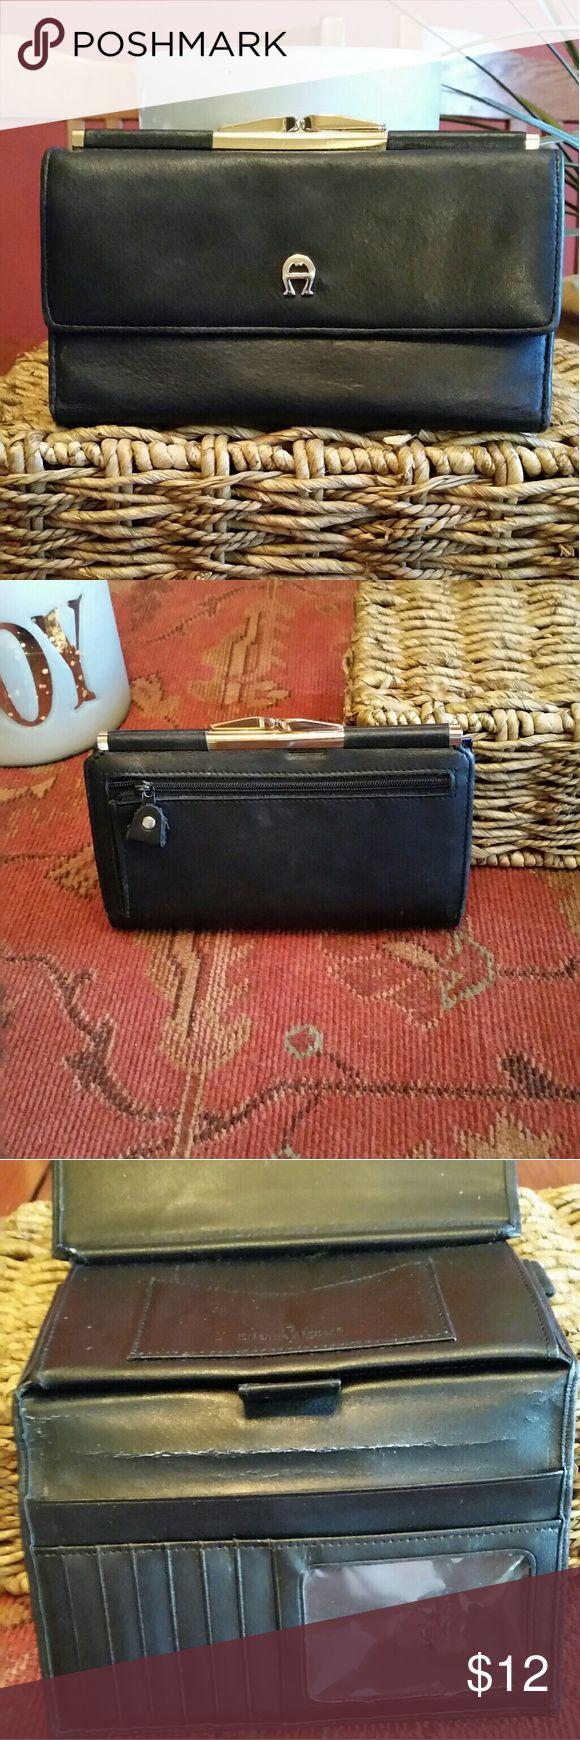 Etienne aigner black leather gloves - Vintage Etienne Aigner Black Leather Wallet Very Good Condition Shows No Signs Of Wear